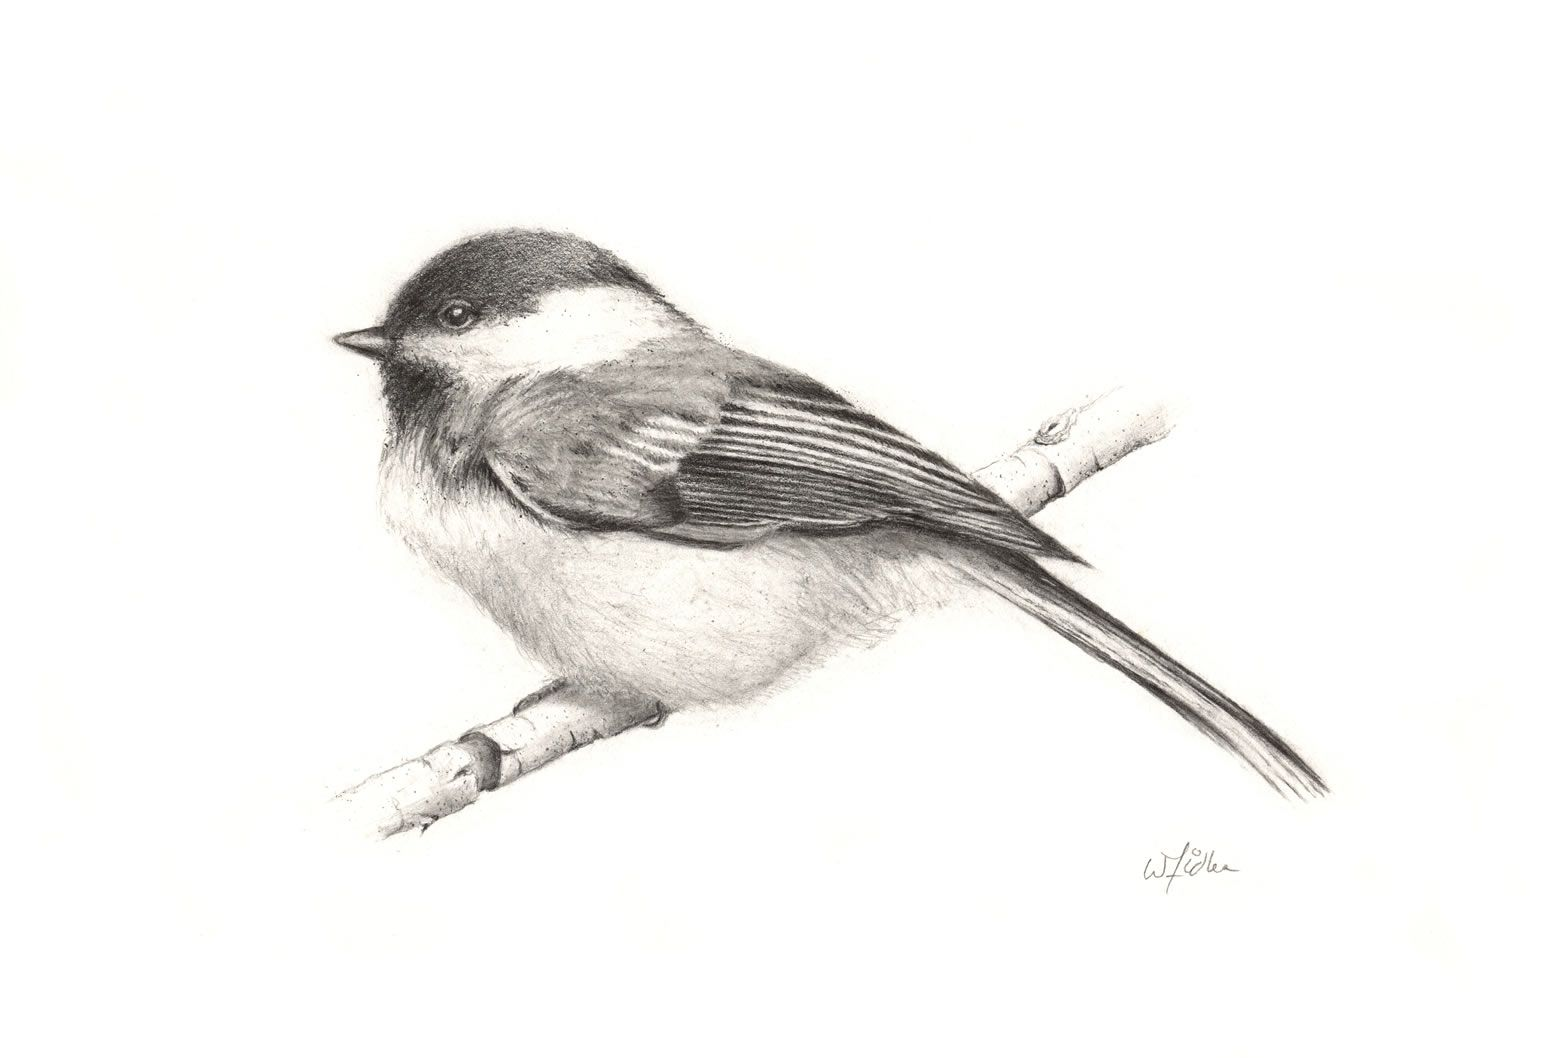 chickadees photos   The Artwork of William Fidler - Pencil ... - photo#22